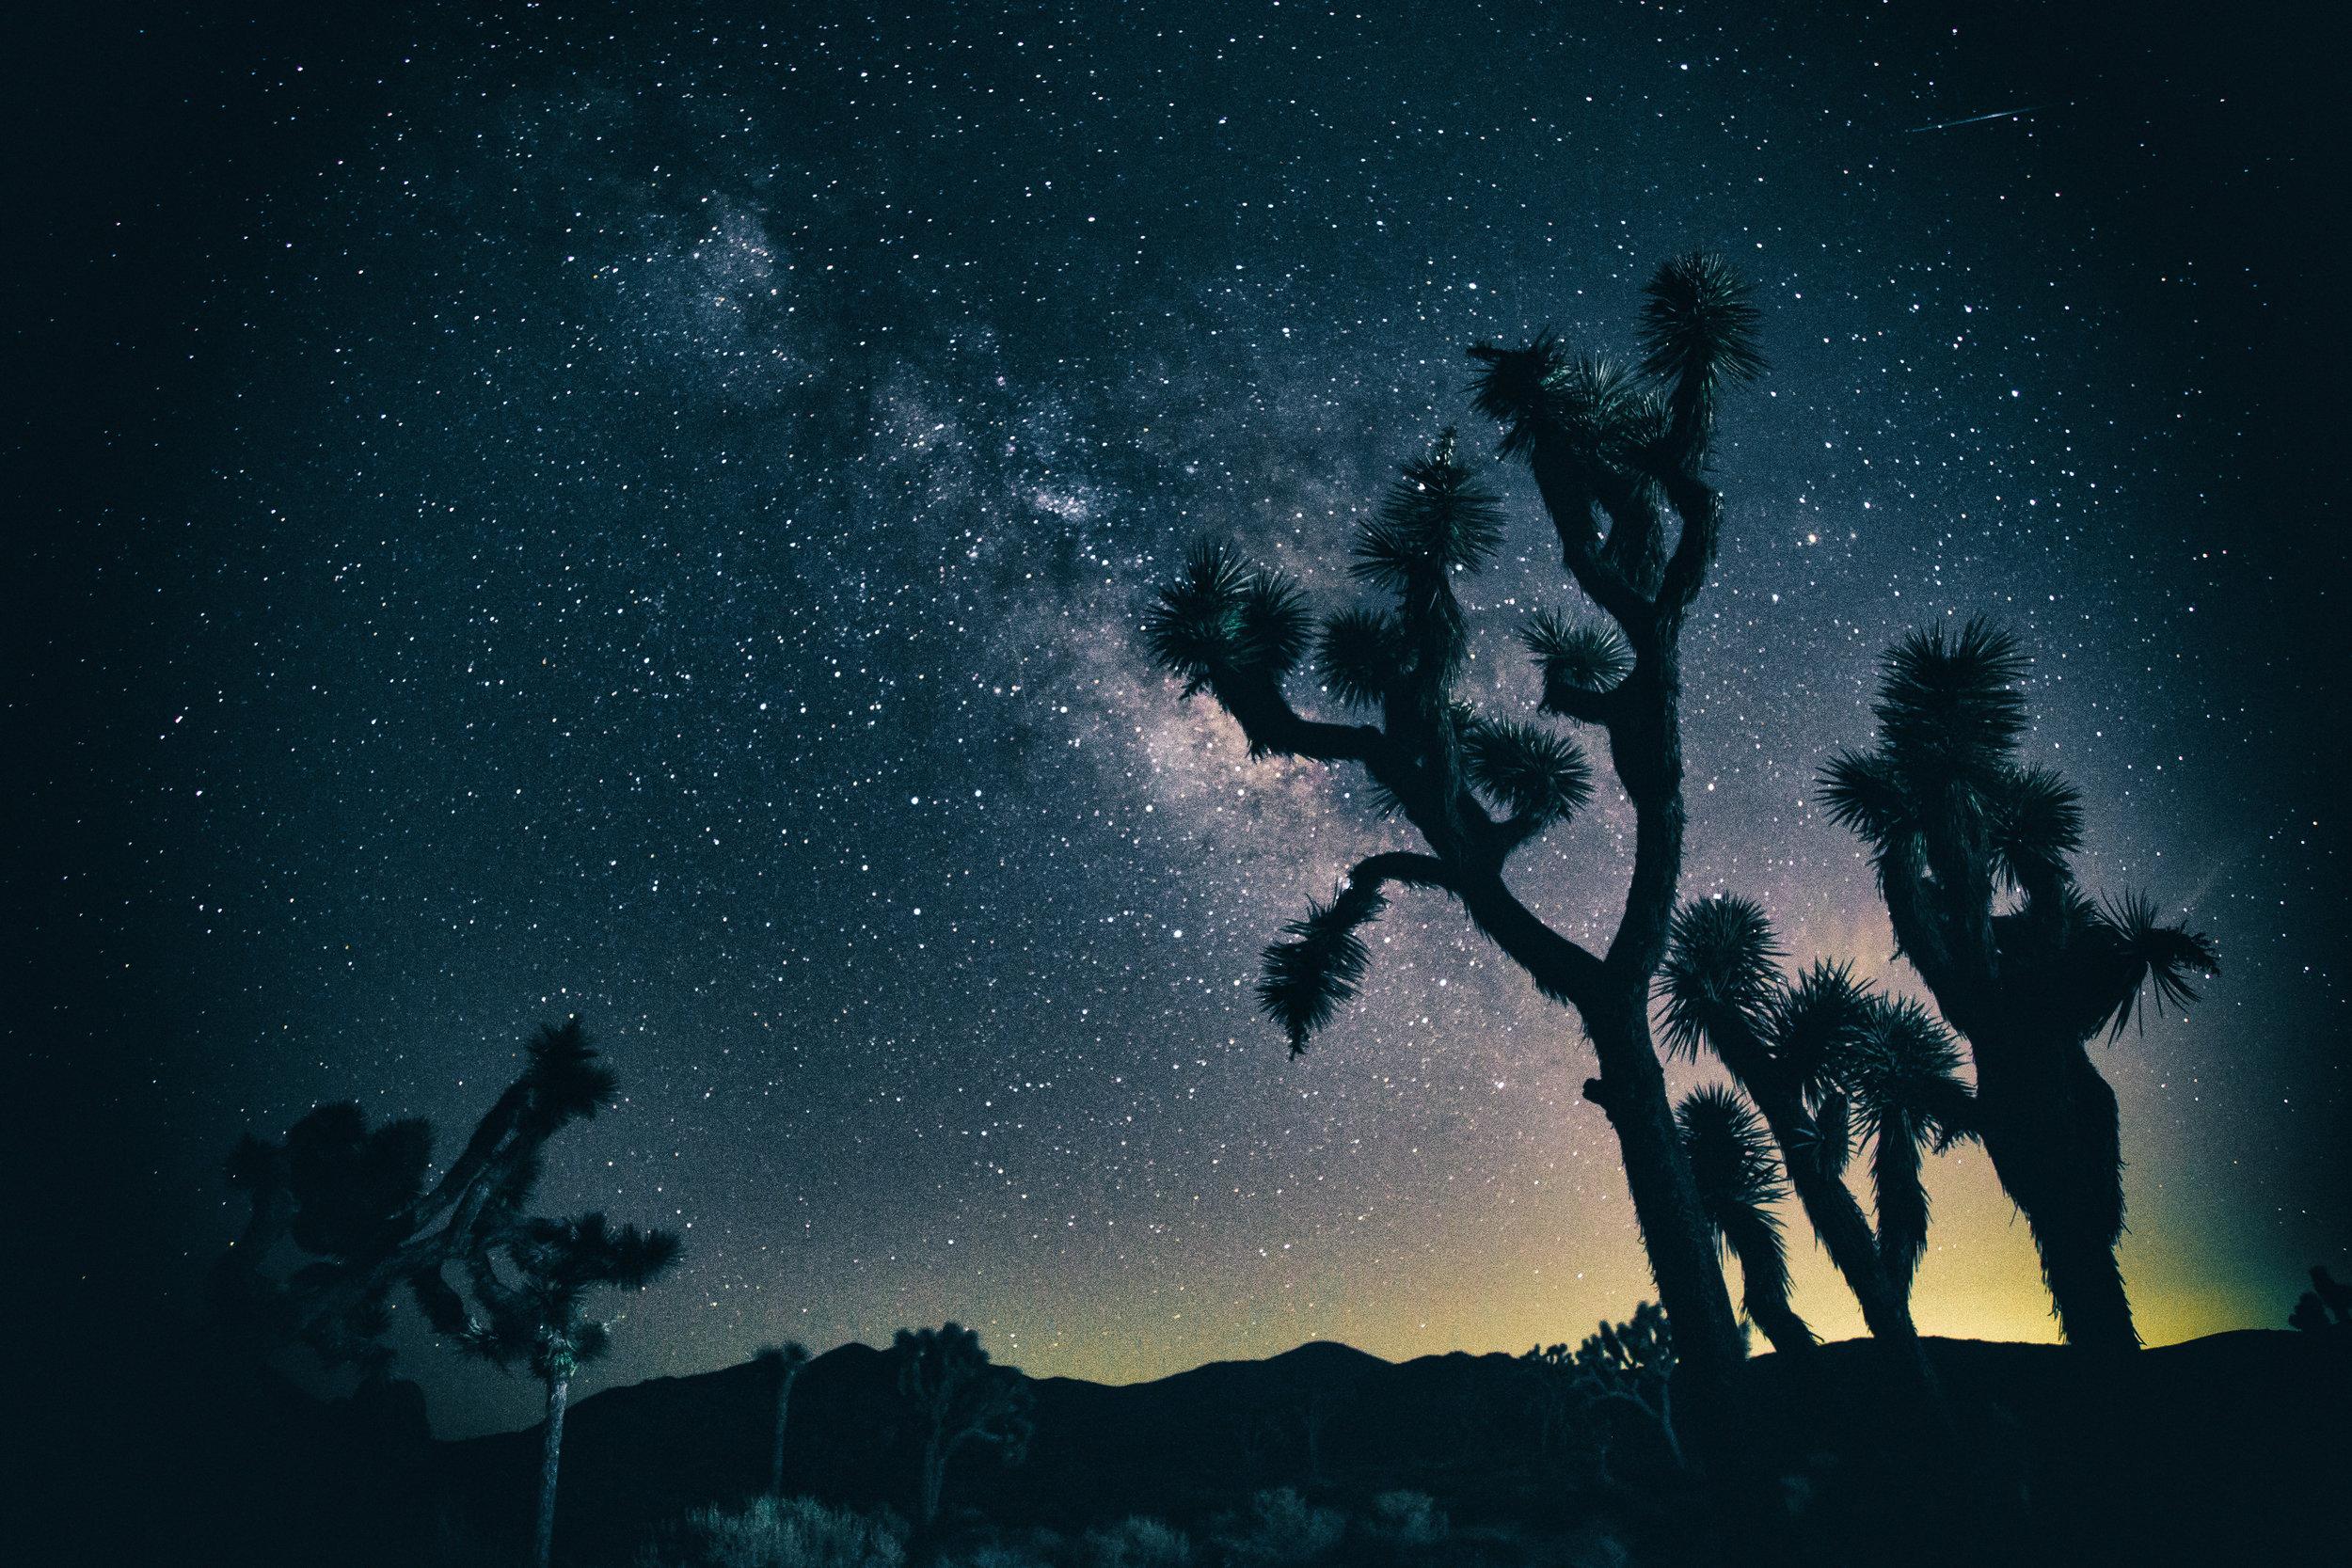 The Milky Way Galaxy from Cap Rock